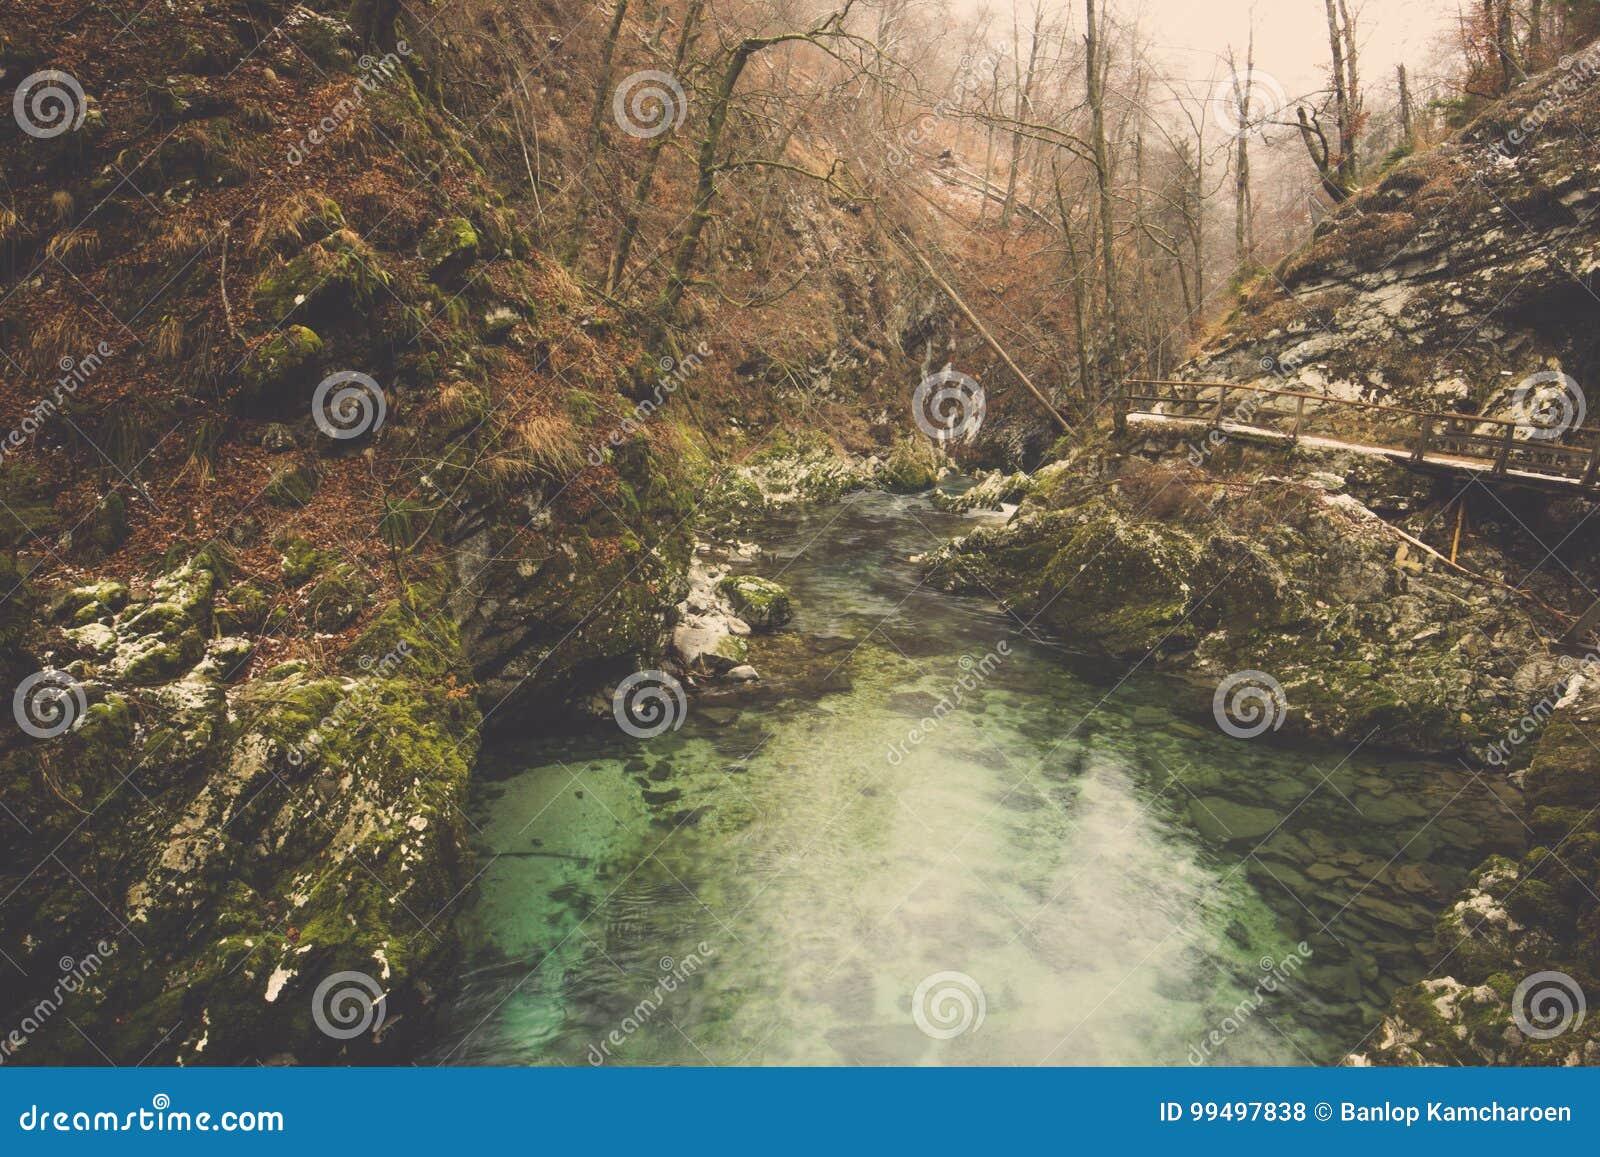 Groen stroomwater en bemost op rotsen in bos